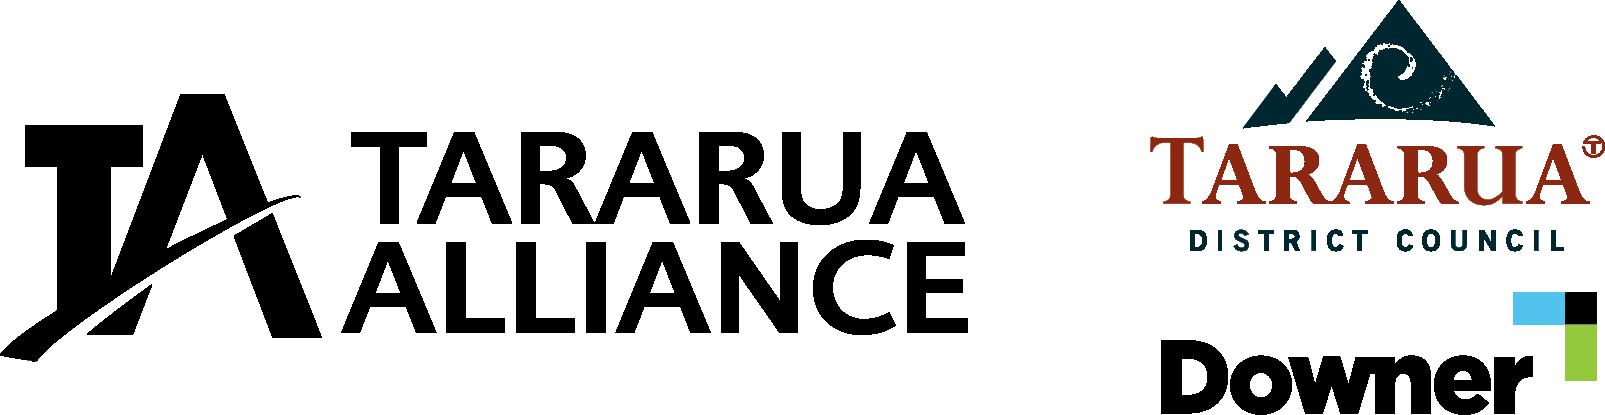 Tararua Alliance logo